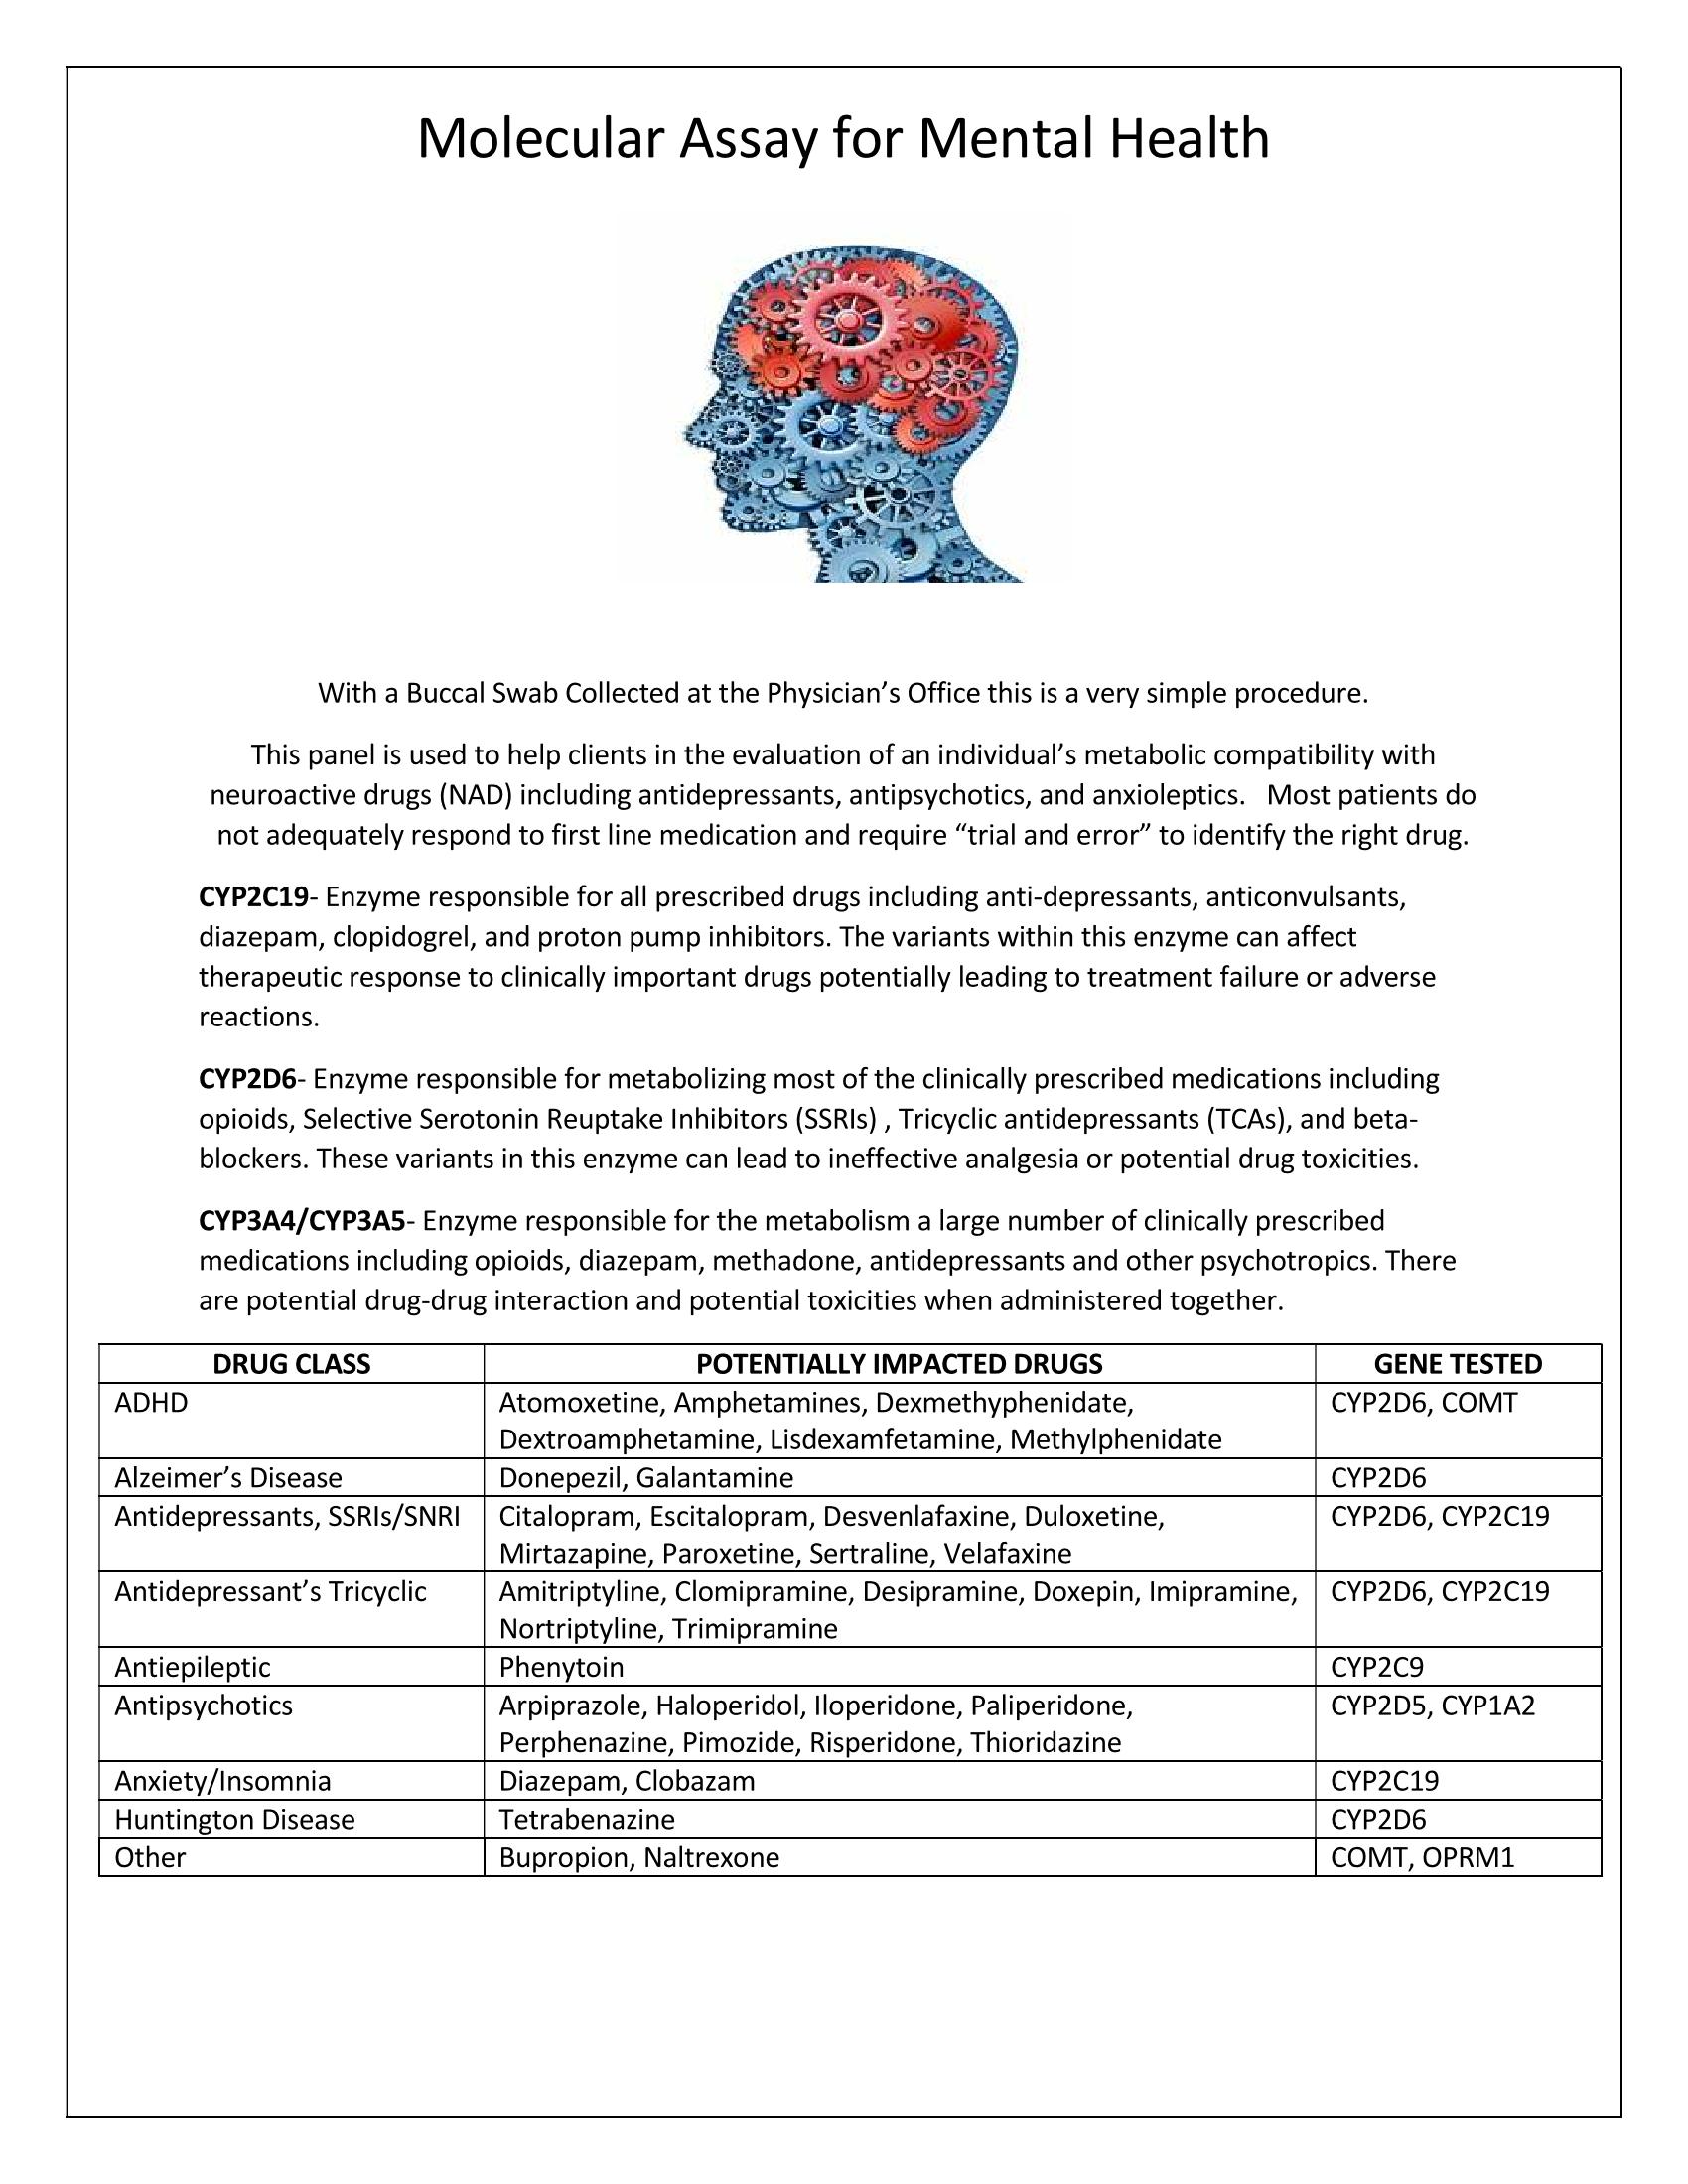 Mental Health Assay — Advanced Genetics Lab